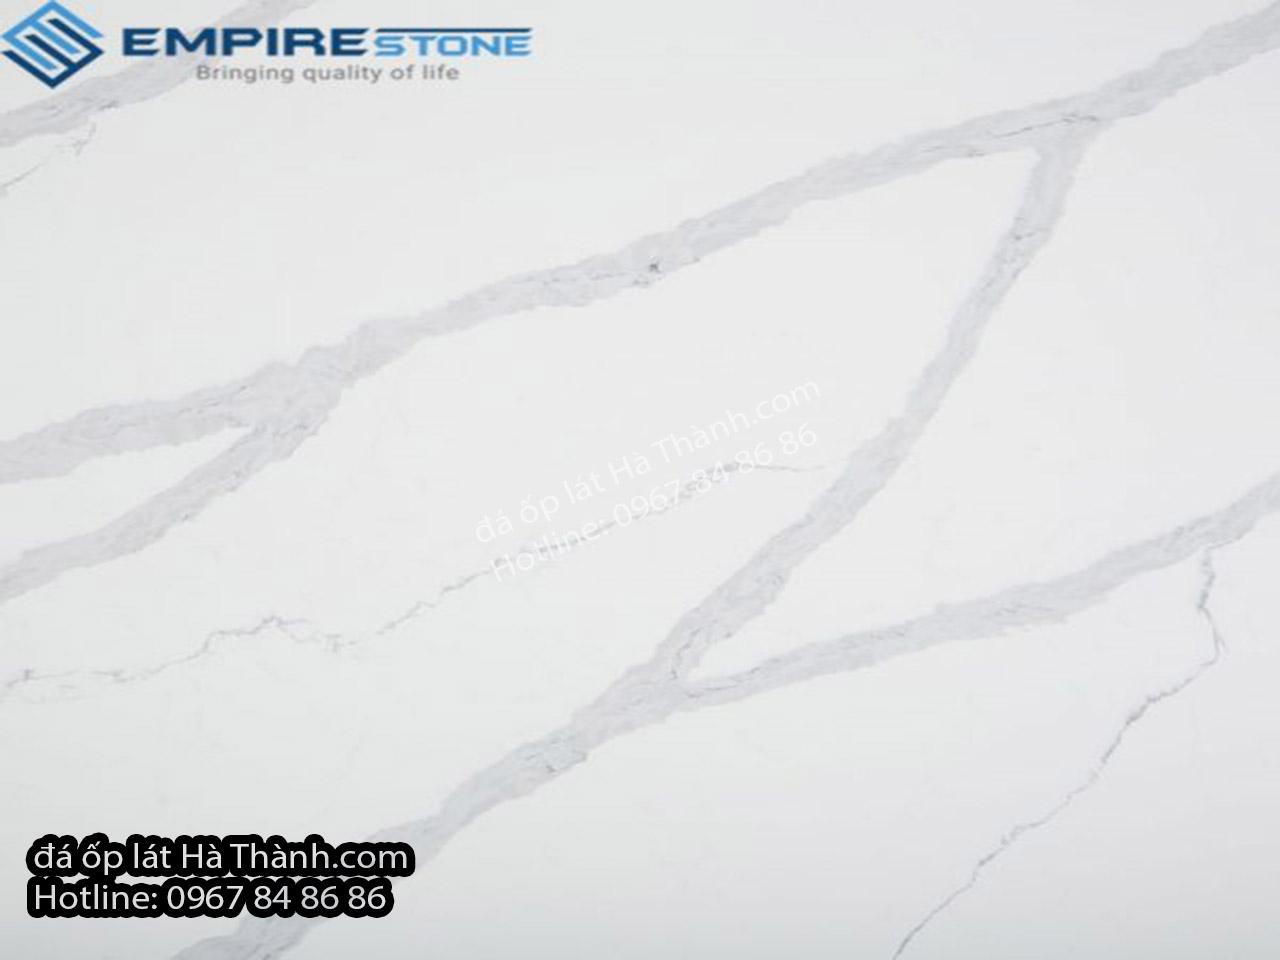 da-nhan-tao-empirestone-PQ118